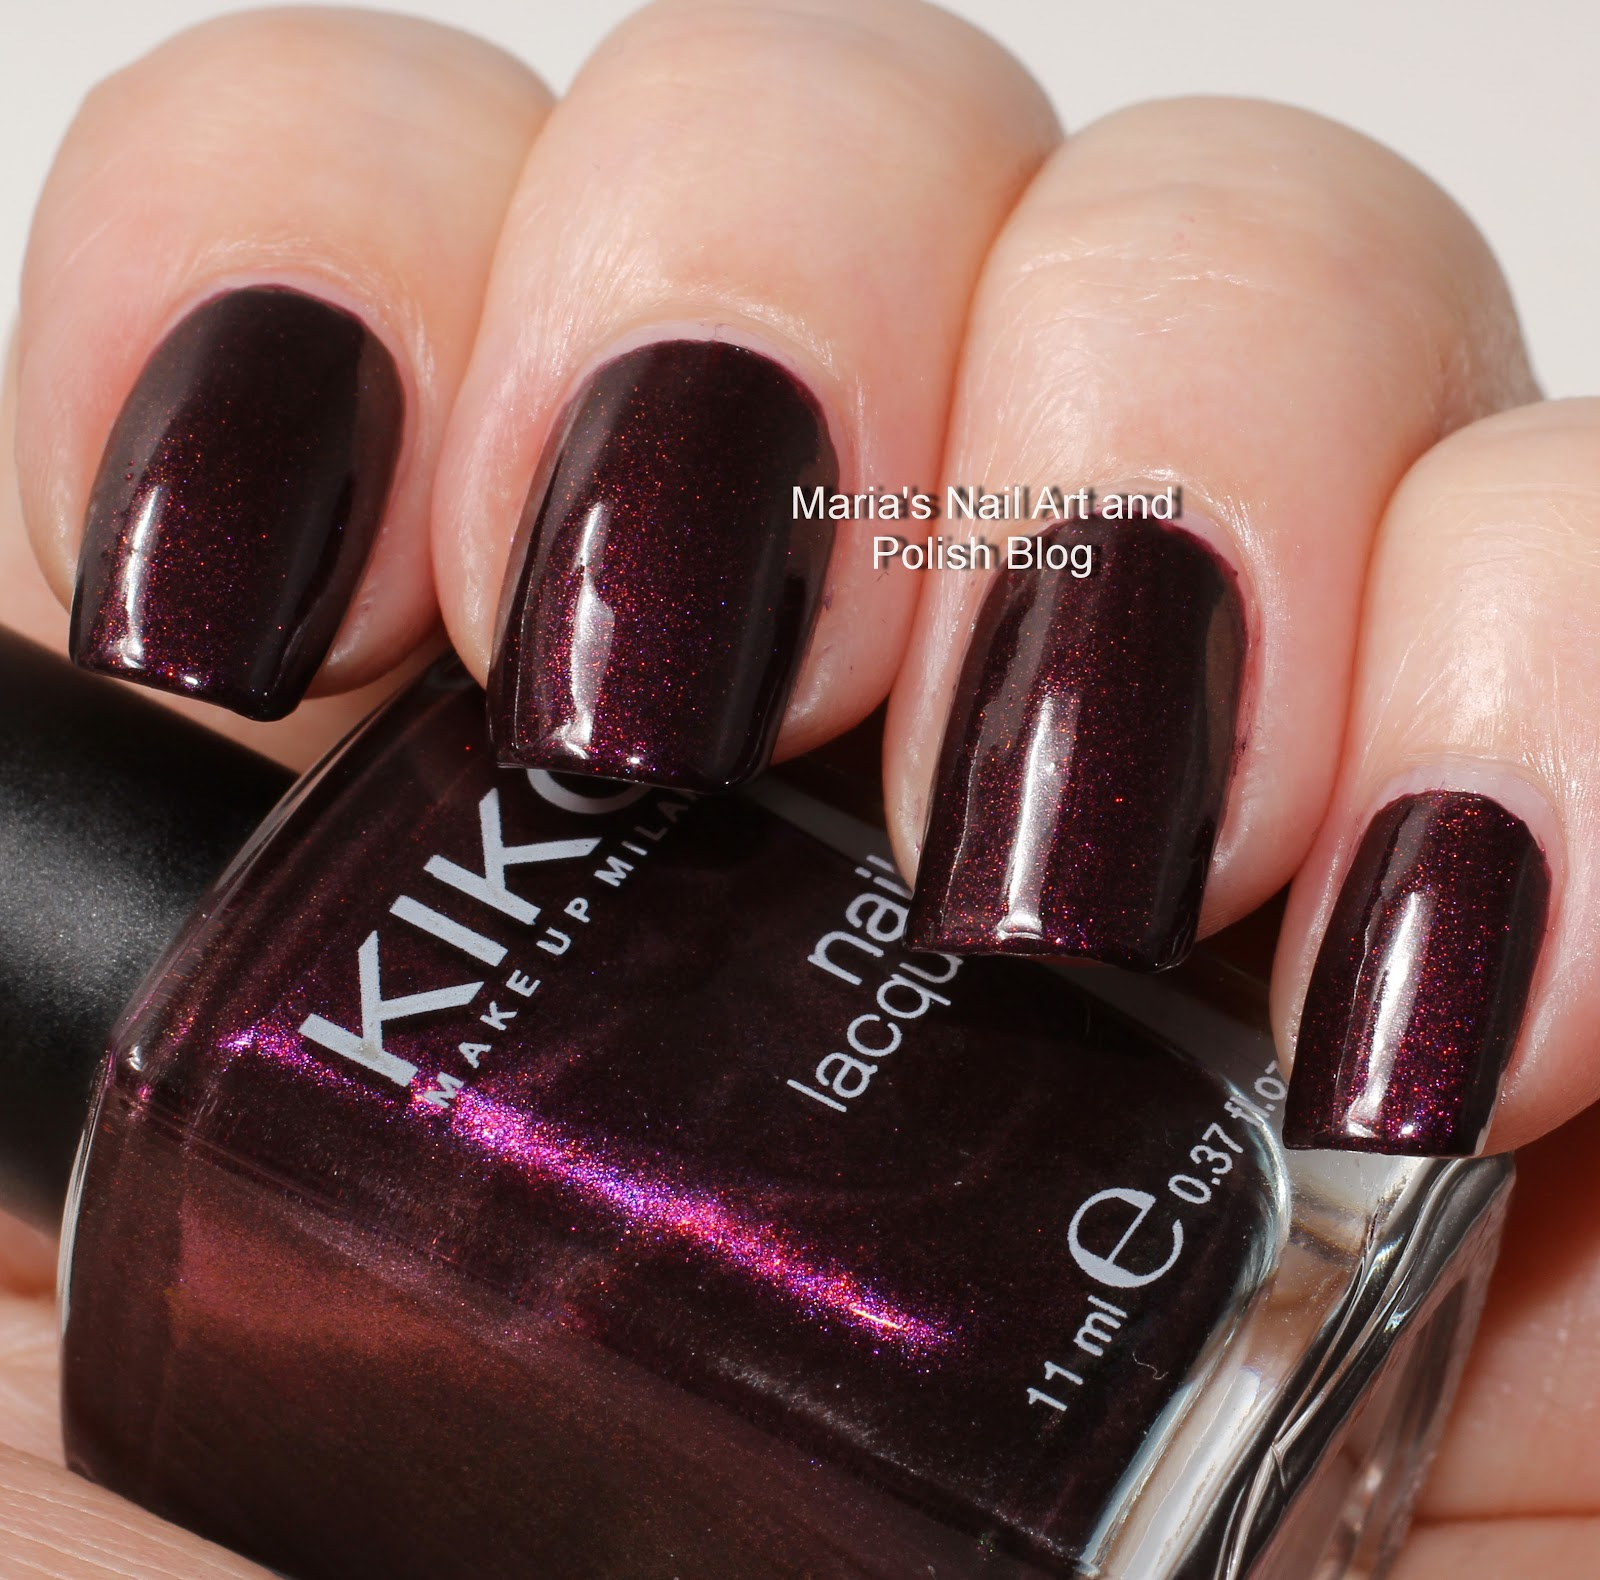 Marias Nail Art And Polish Blog Flushed With Stripes And: Marias Nail Art And Polish Blog: Kiko 245 Pearly Dark Ruby